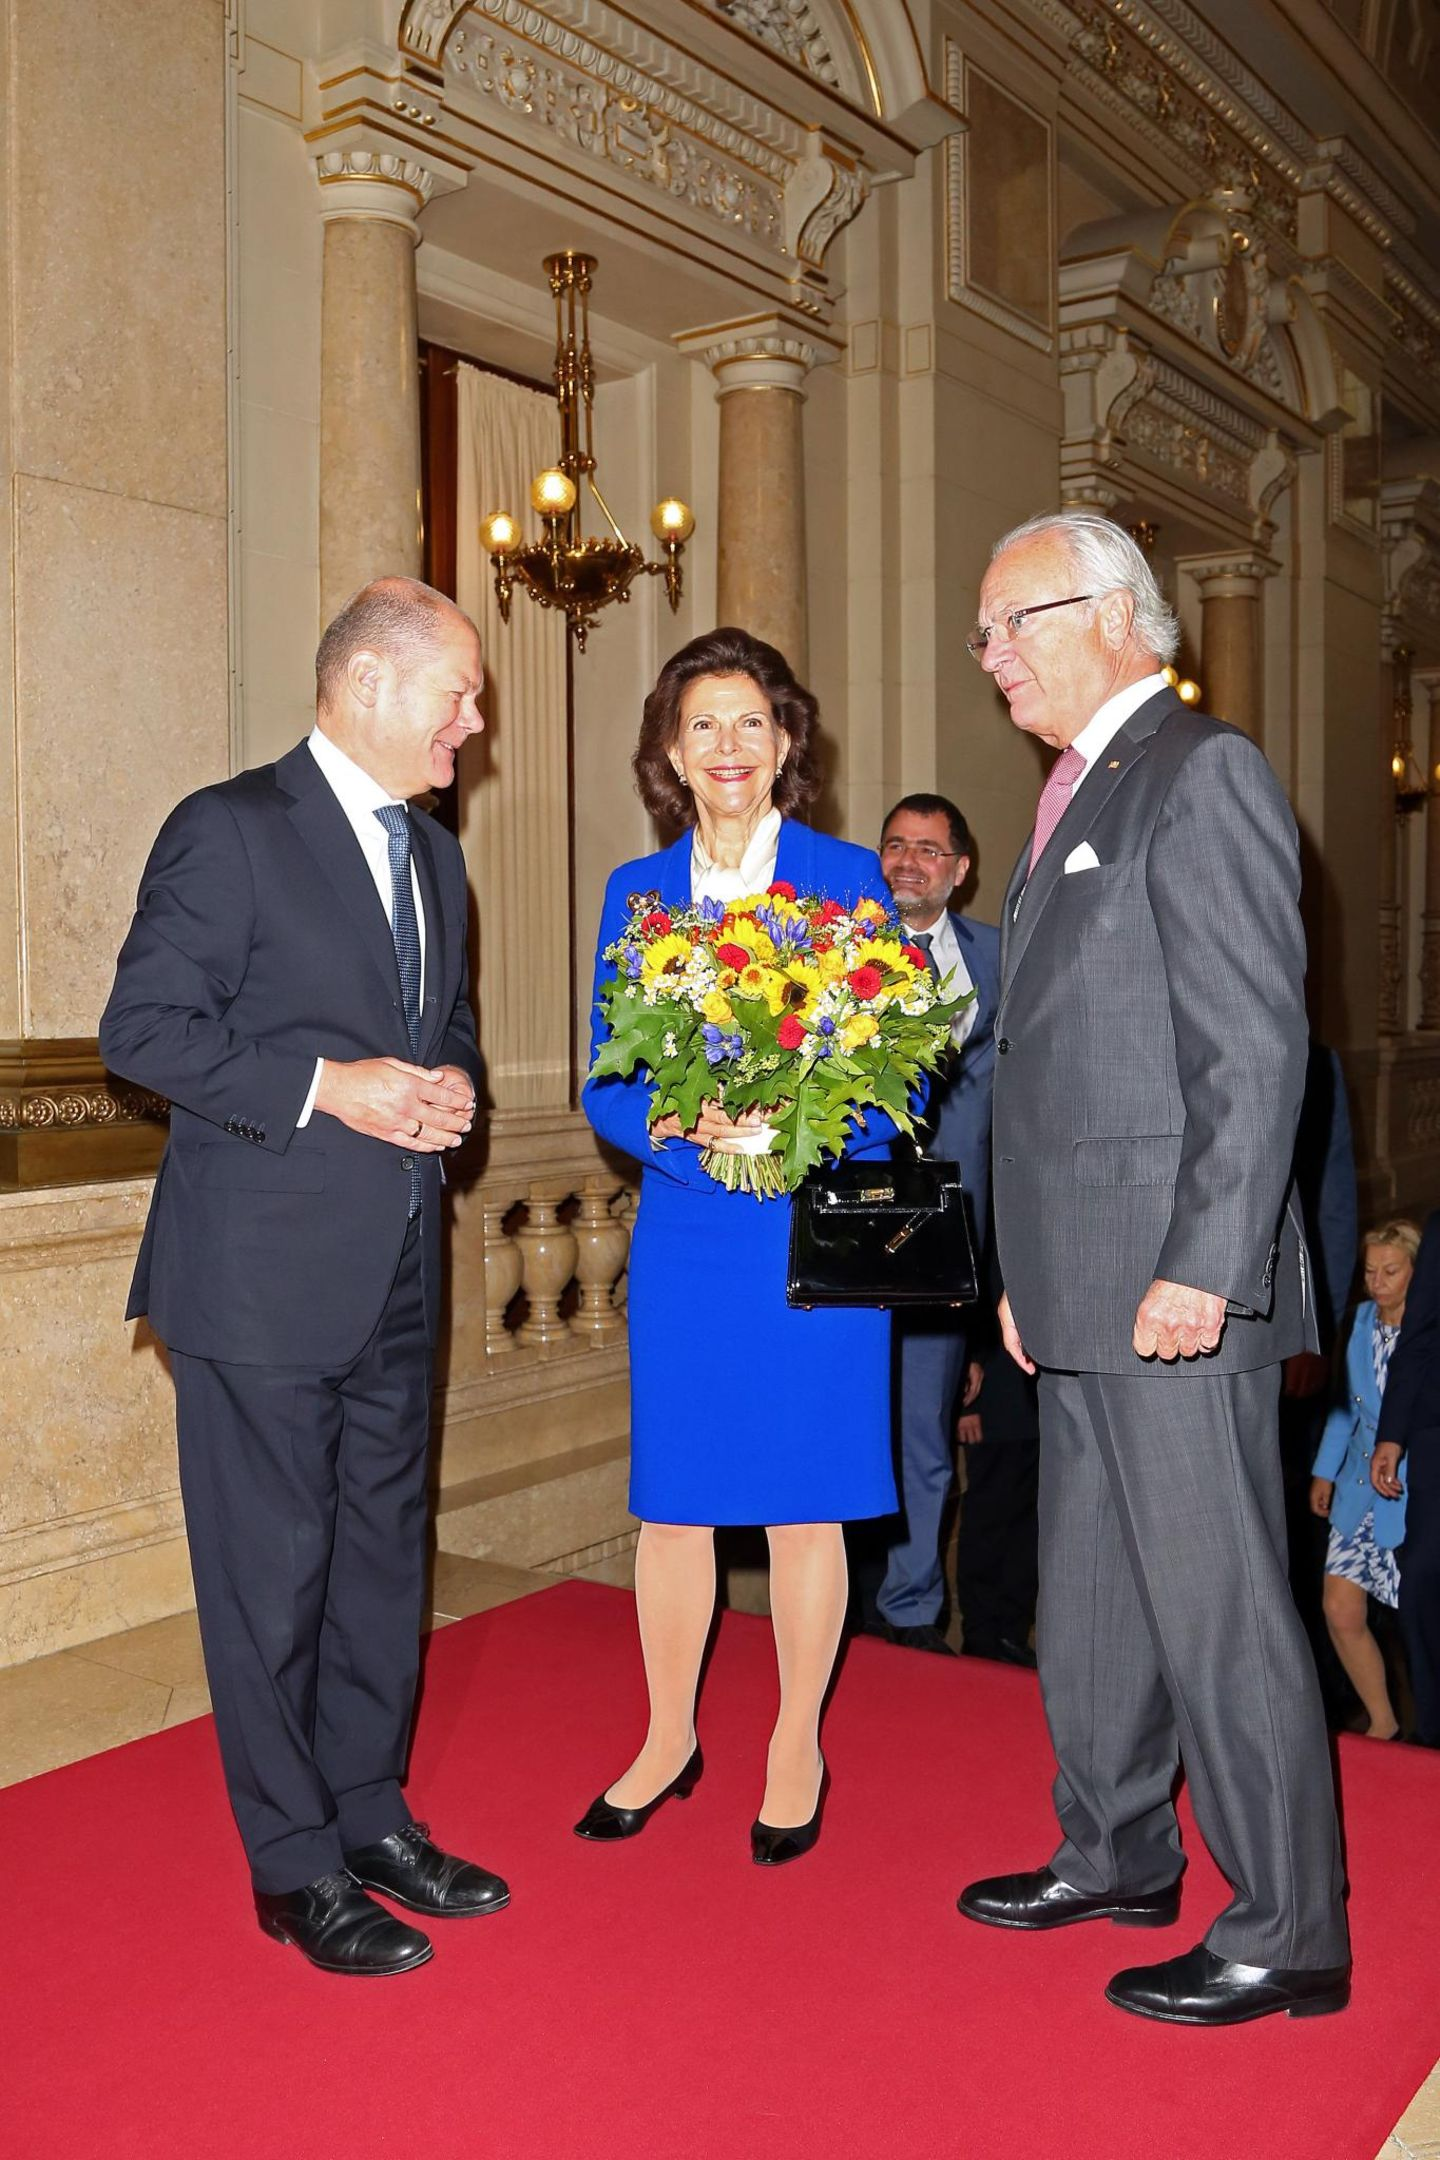 Tag 2  Hamburgs Bürgermeister Olaf Scholz heißt das Königspaar im wunderschönen Hamburger Rathaus willkommen.